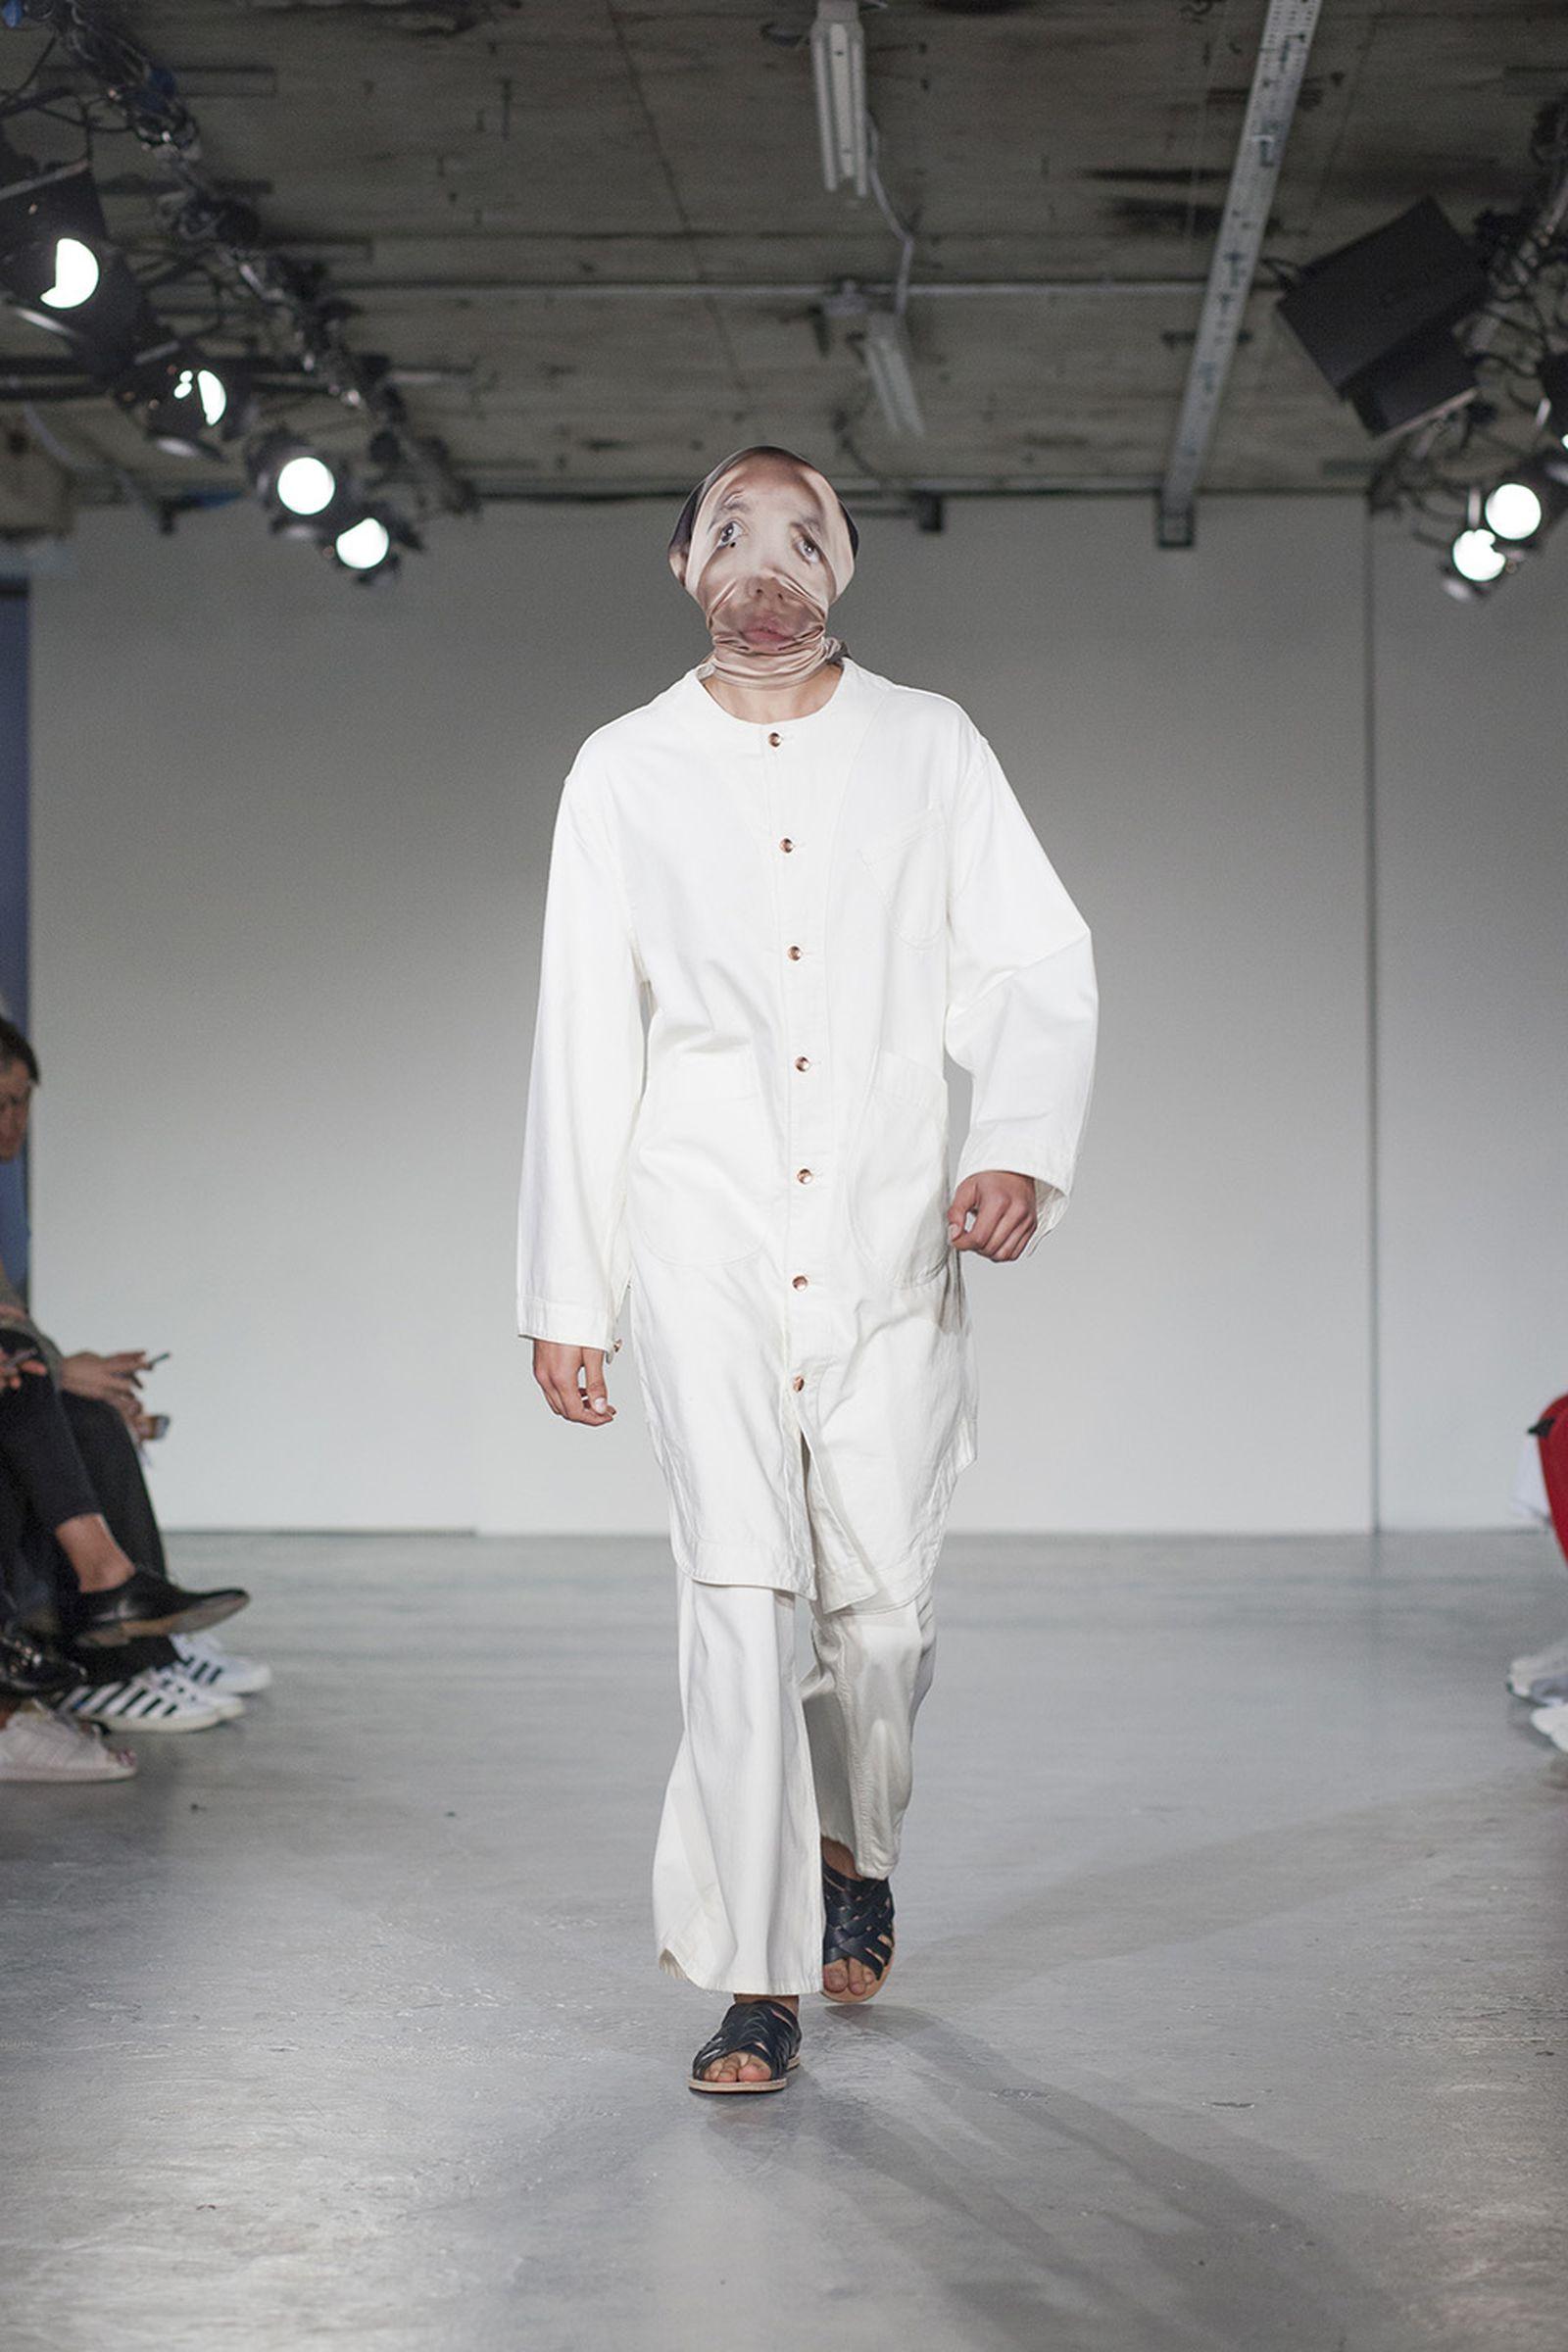 alex mullins ss18 London Fashion Week Men's SS18 runway